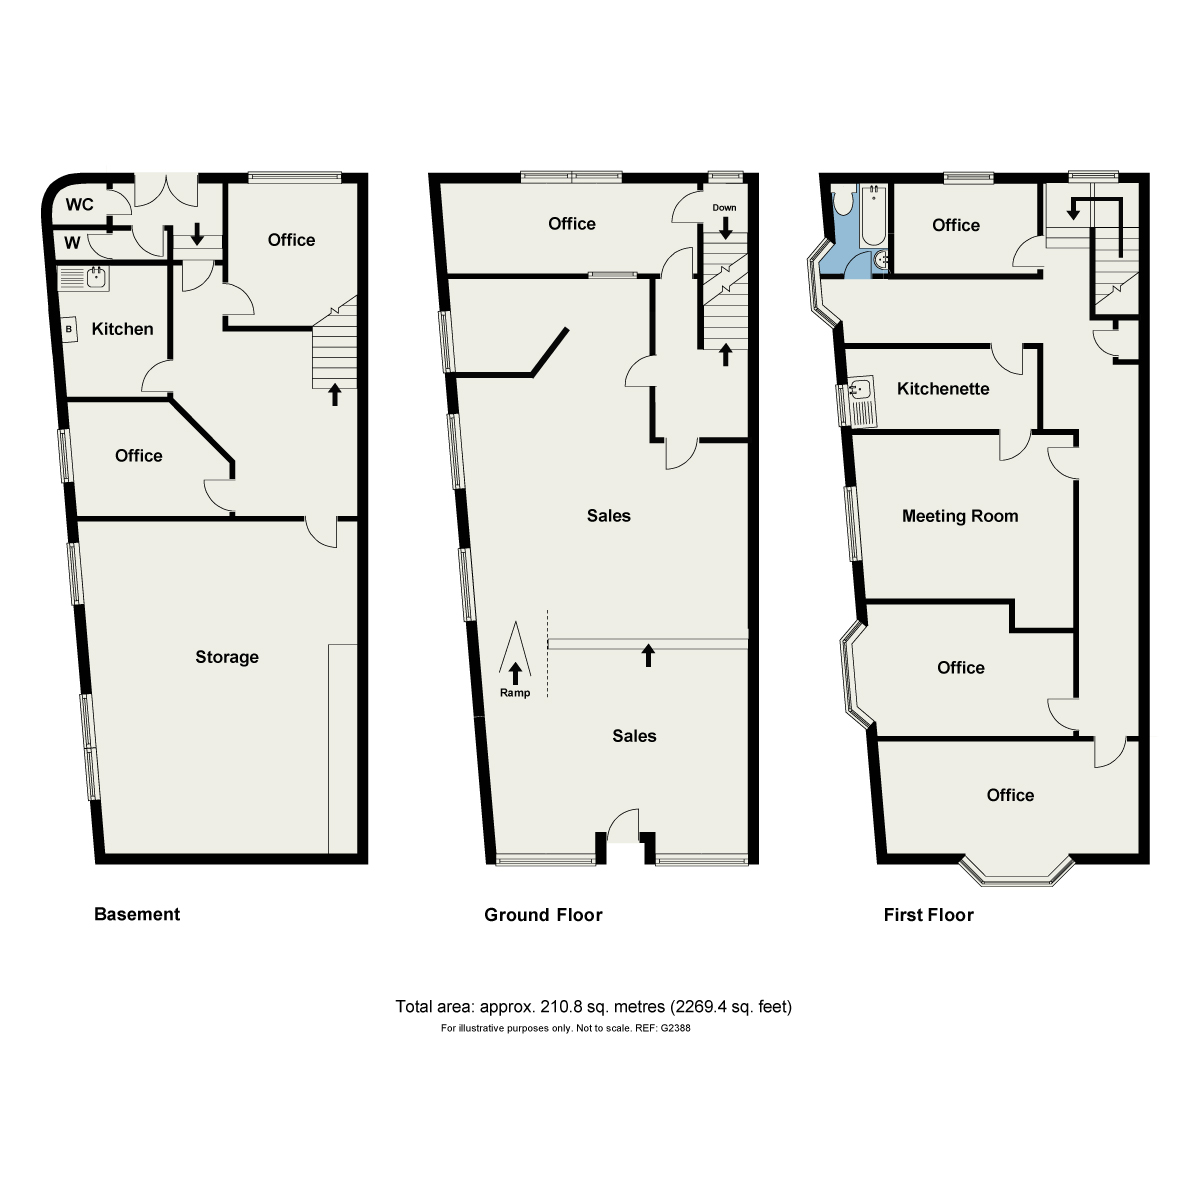 Floorplan Morecambe Bank Building, Main Street, Grange-over-Sands, Cumbria, LA11 6DP